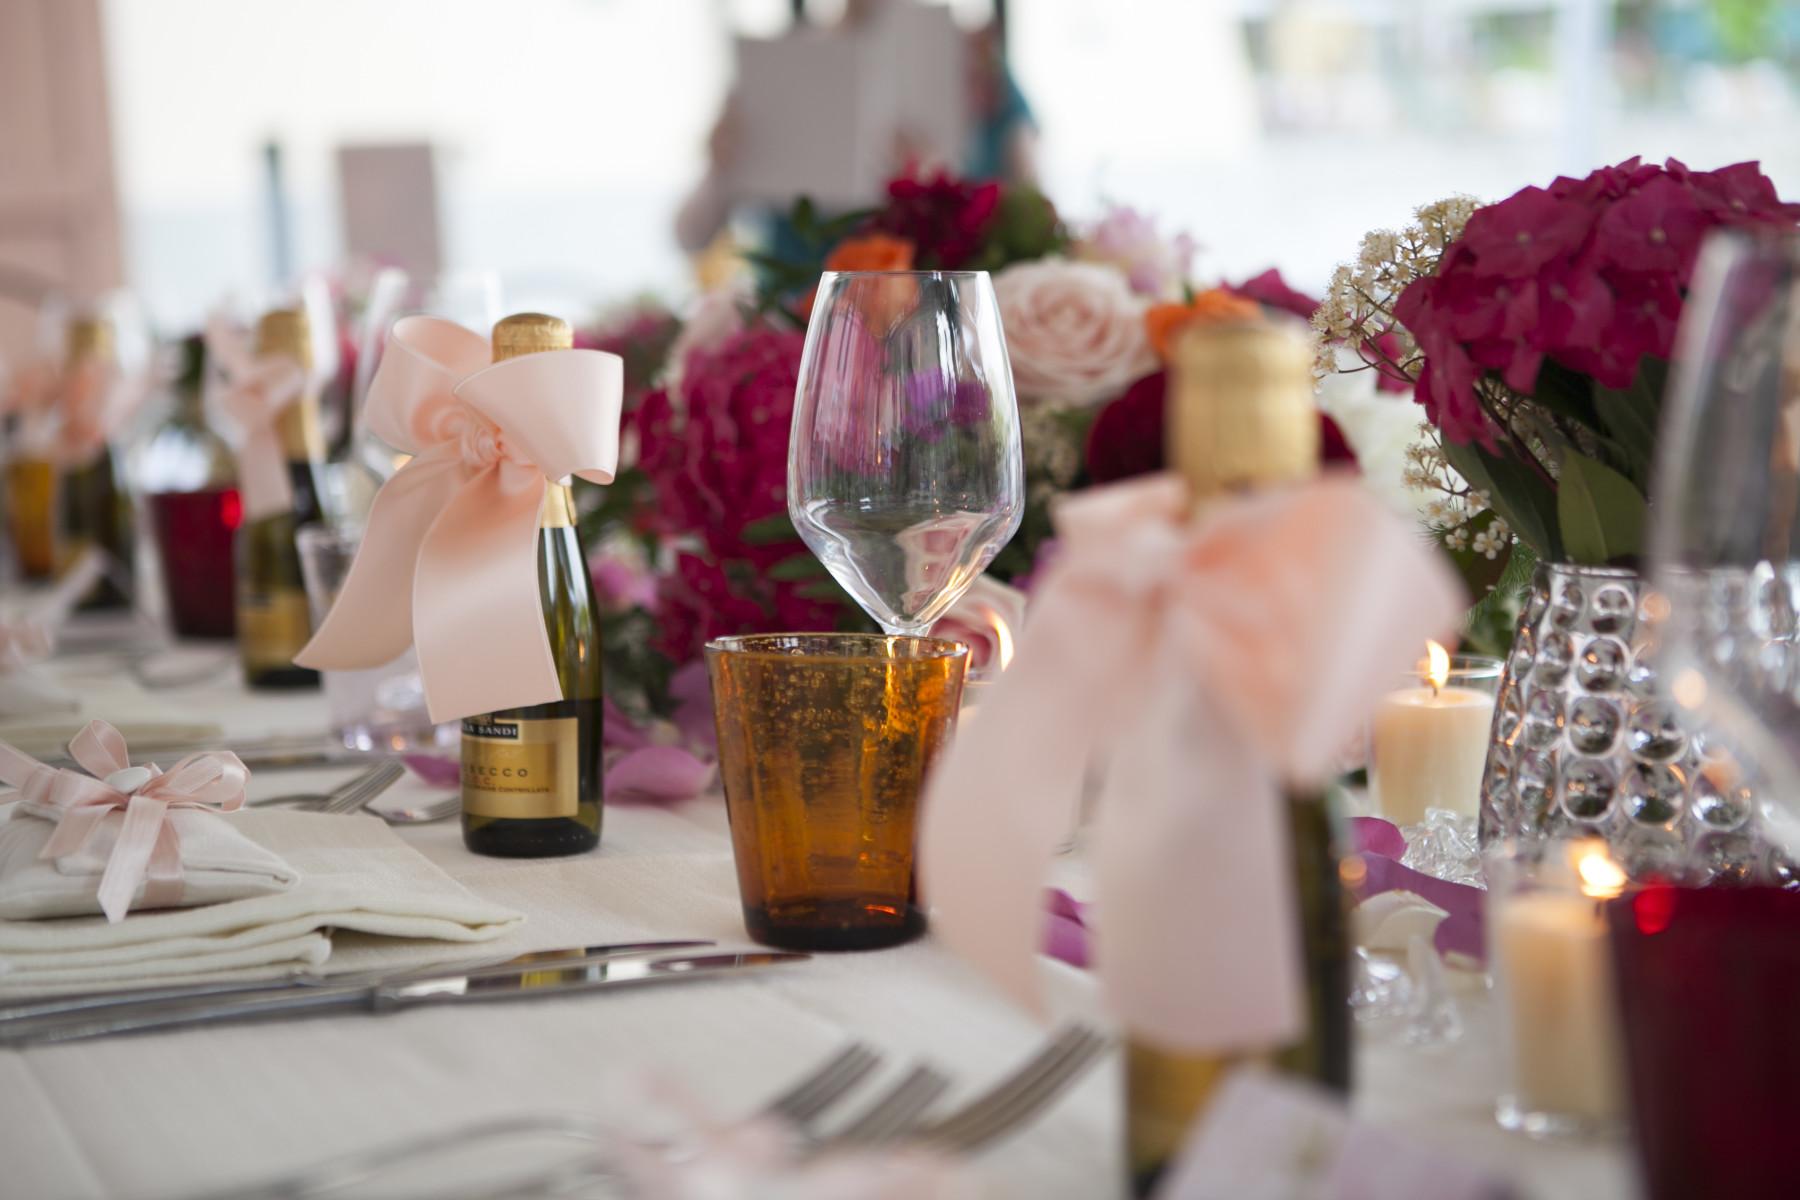 Floral Decorations - Florals - La Tirlindana - Lake Como - Italy